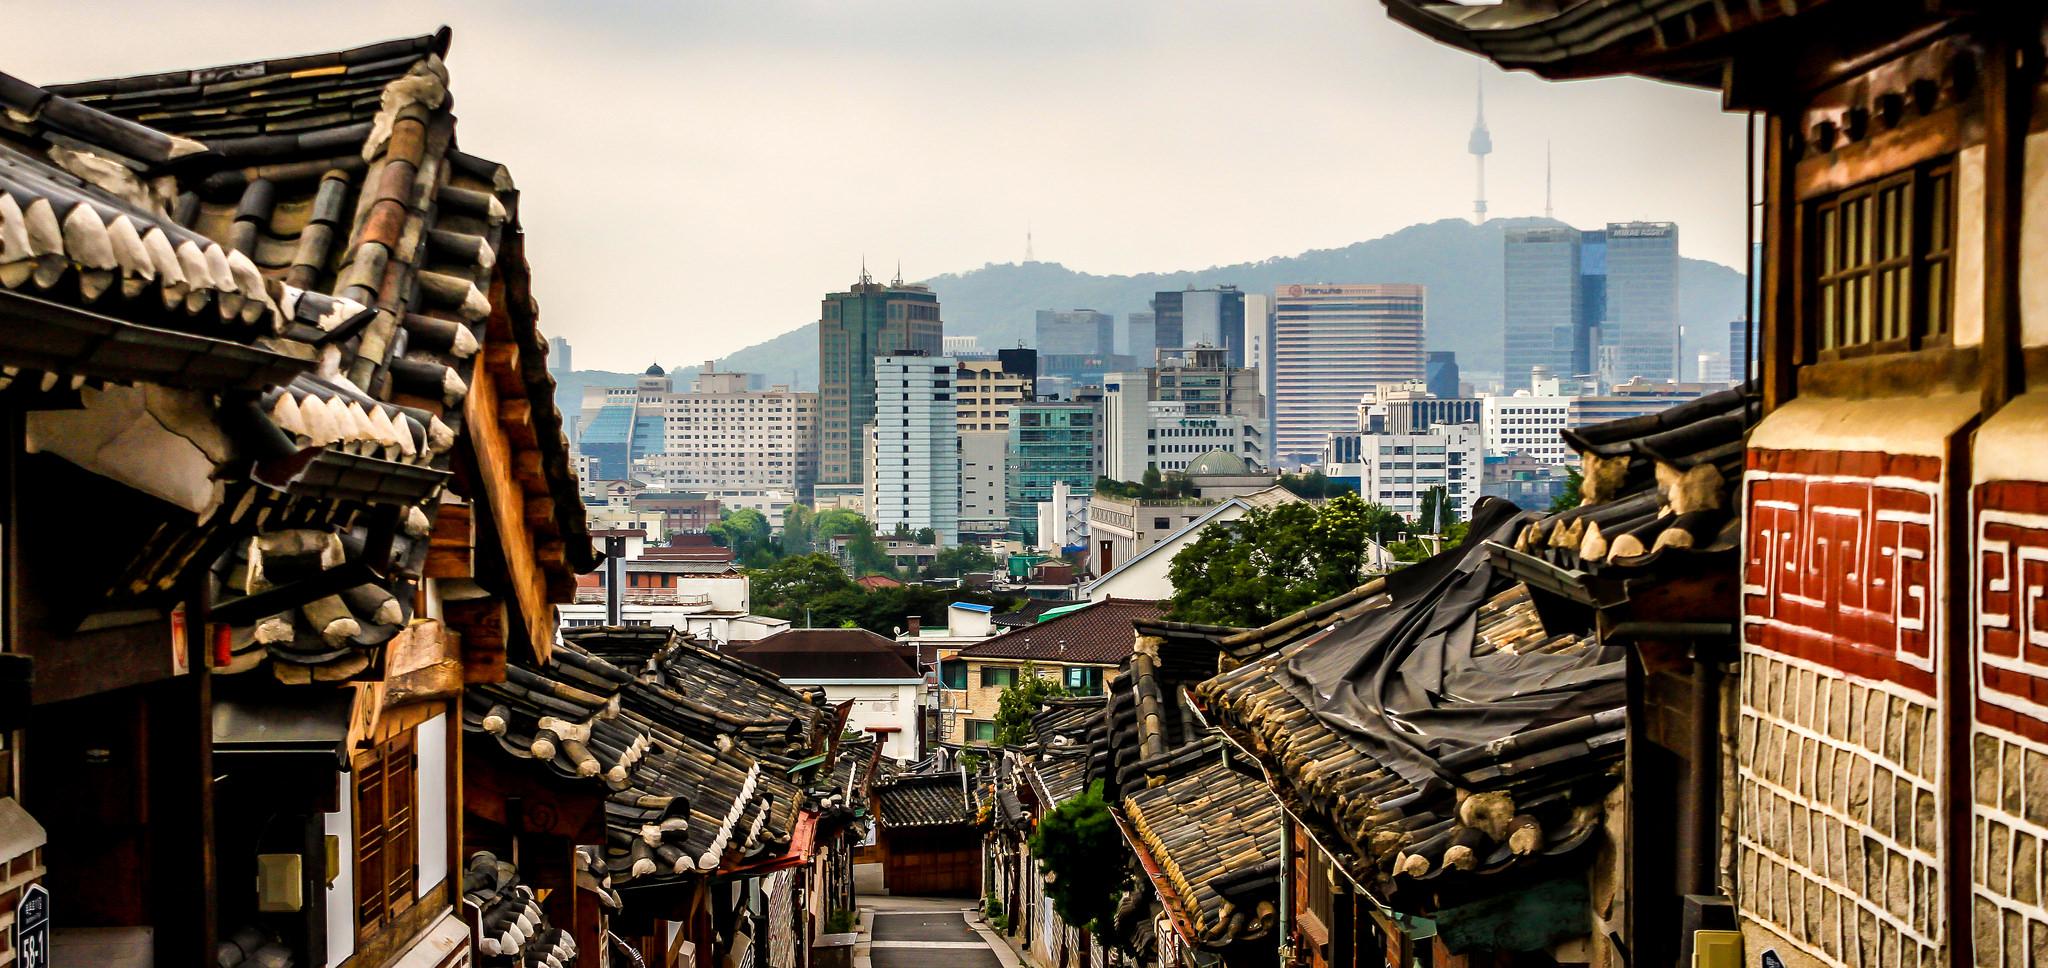 Bukchon Hanok Village May Be South Korea S Best Kept Secret